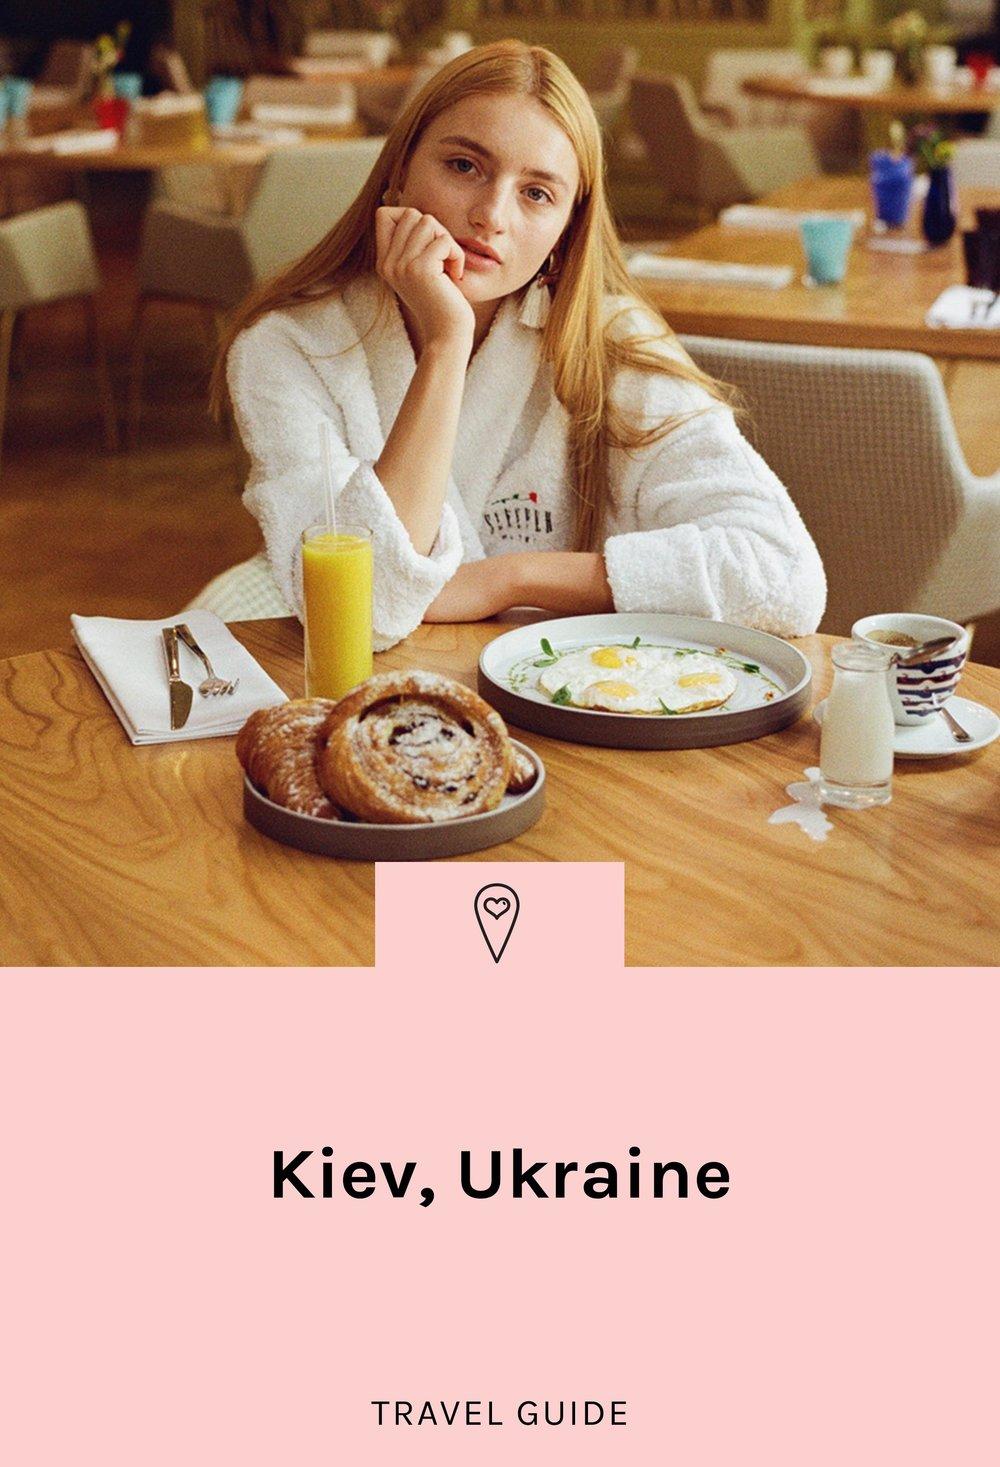 lisa-says-gah-travel-guide-kyiv-ukraine